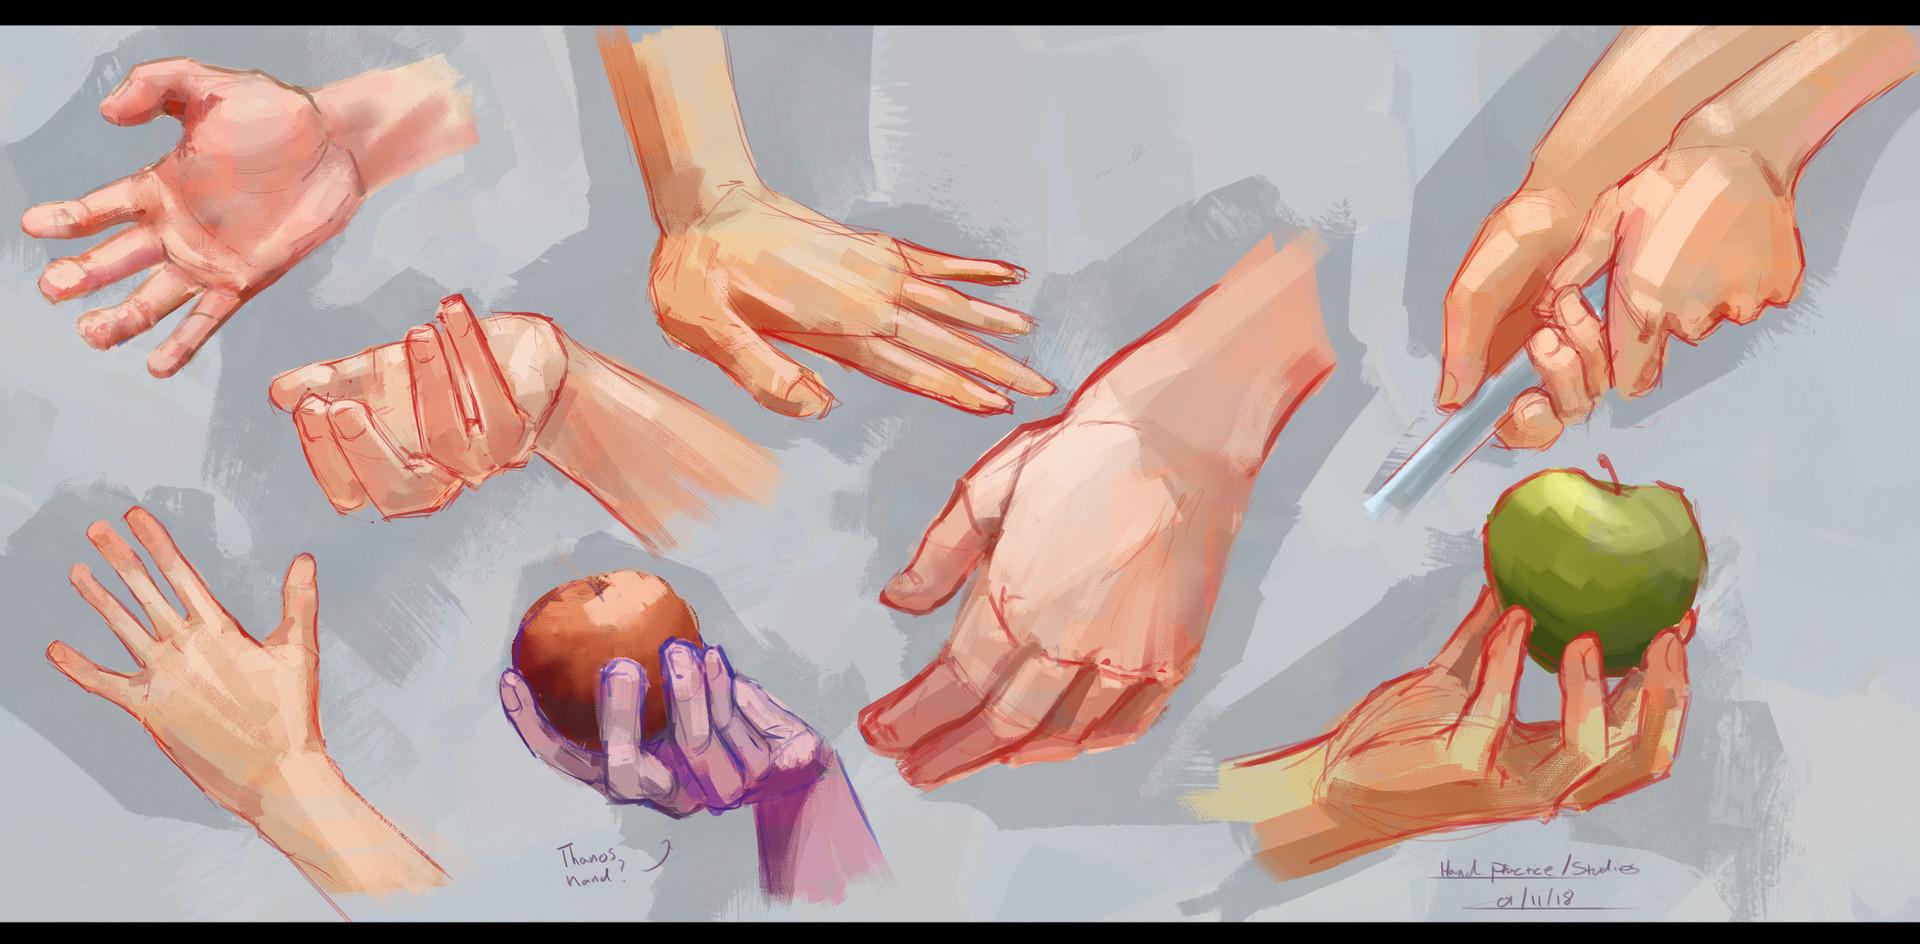 Jack dowell hand practice